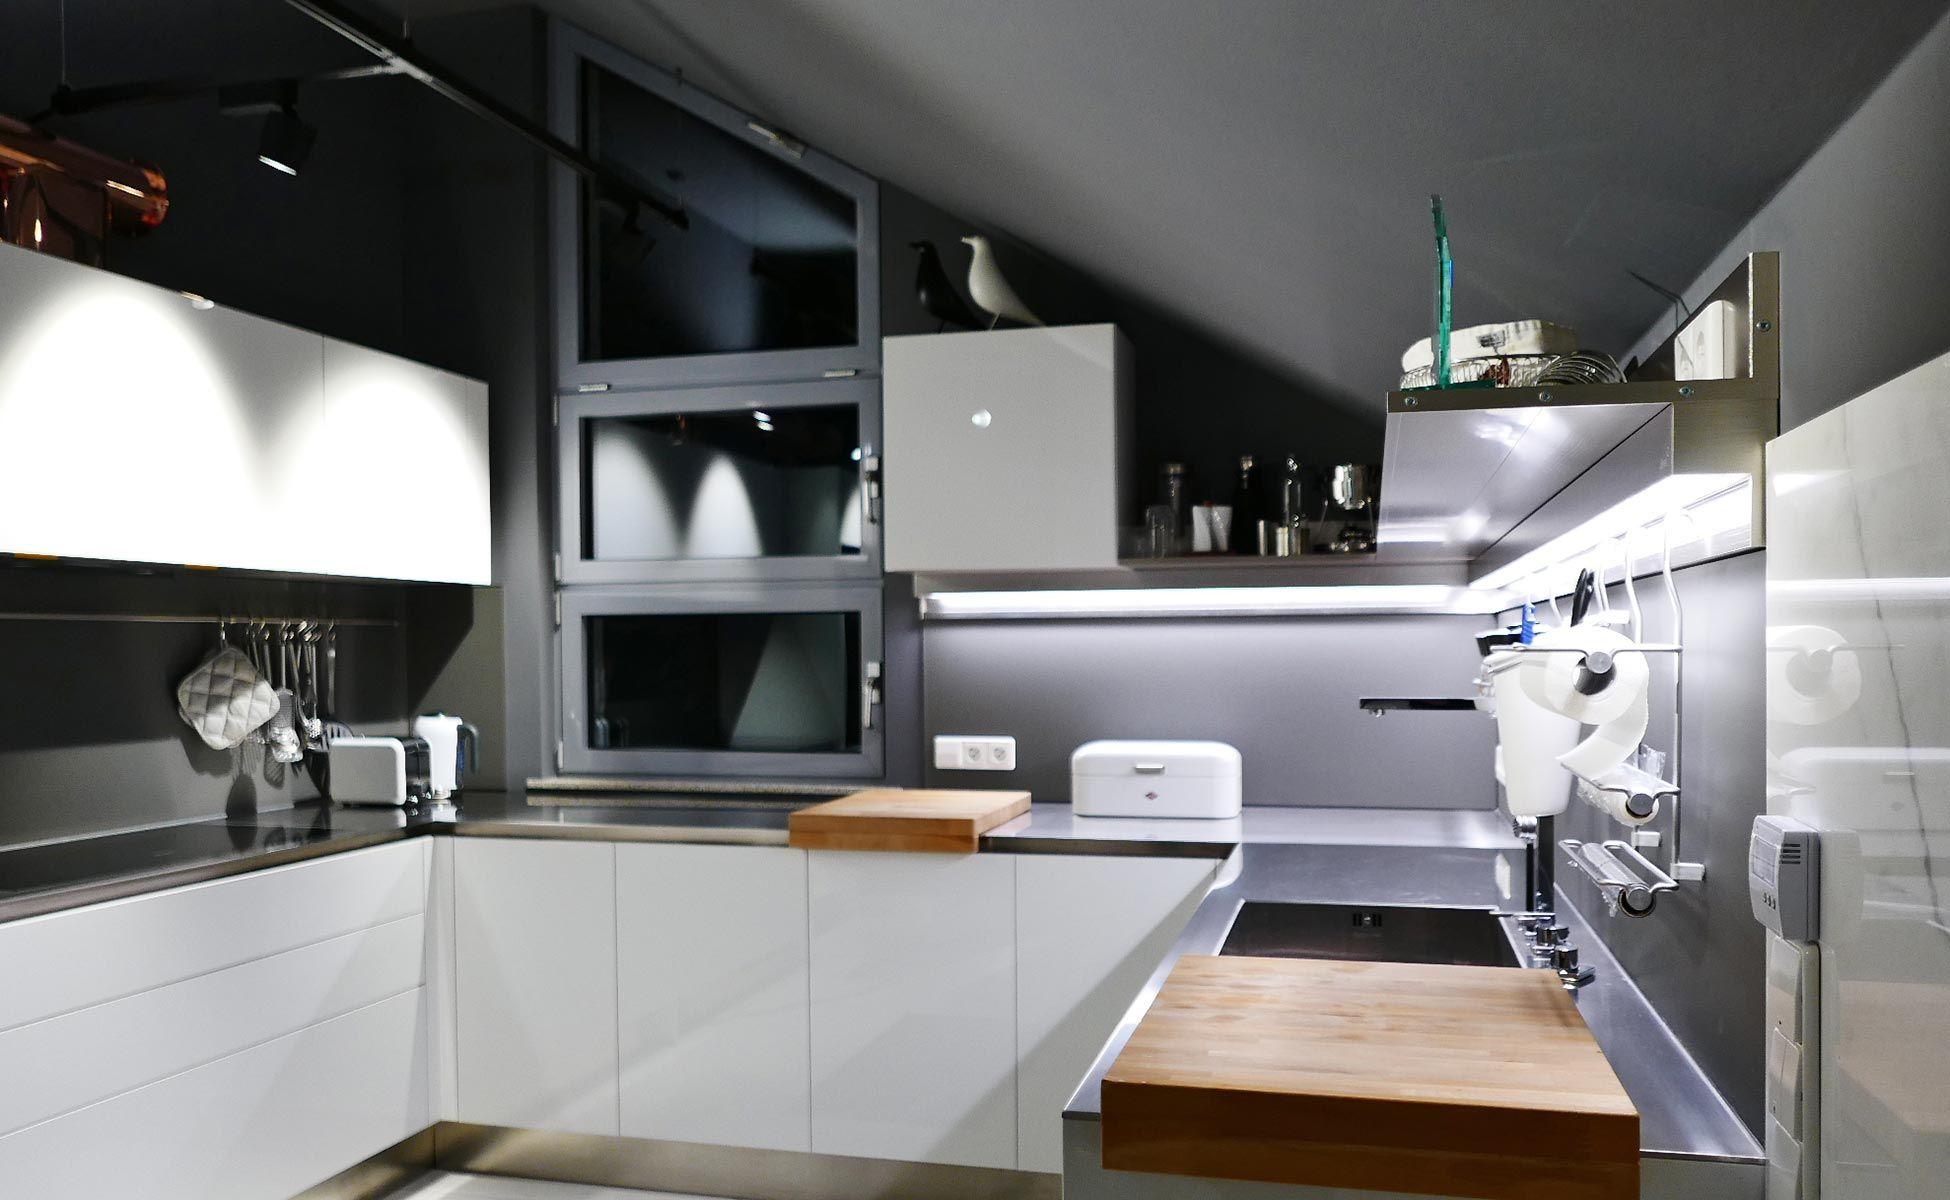 Küchenbau Berlin arclinea küchen edelstahl arbeitsfläche bei steidten in berlin